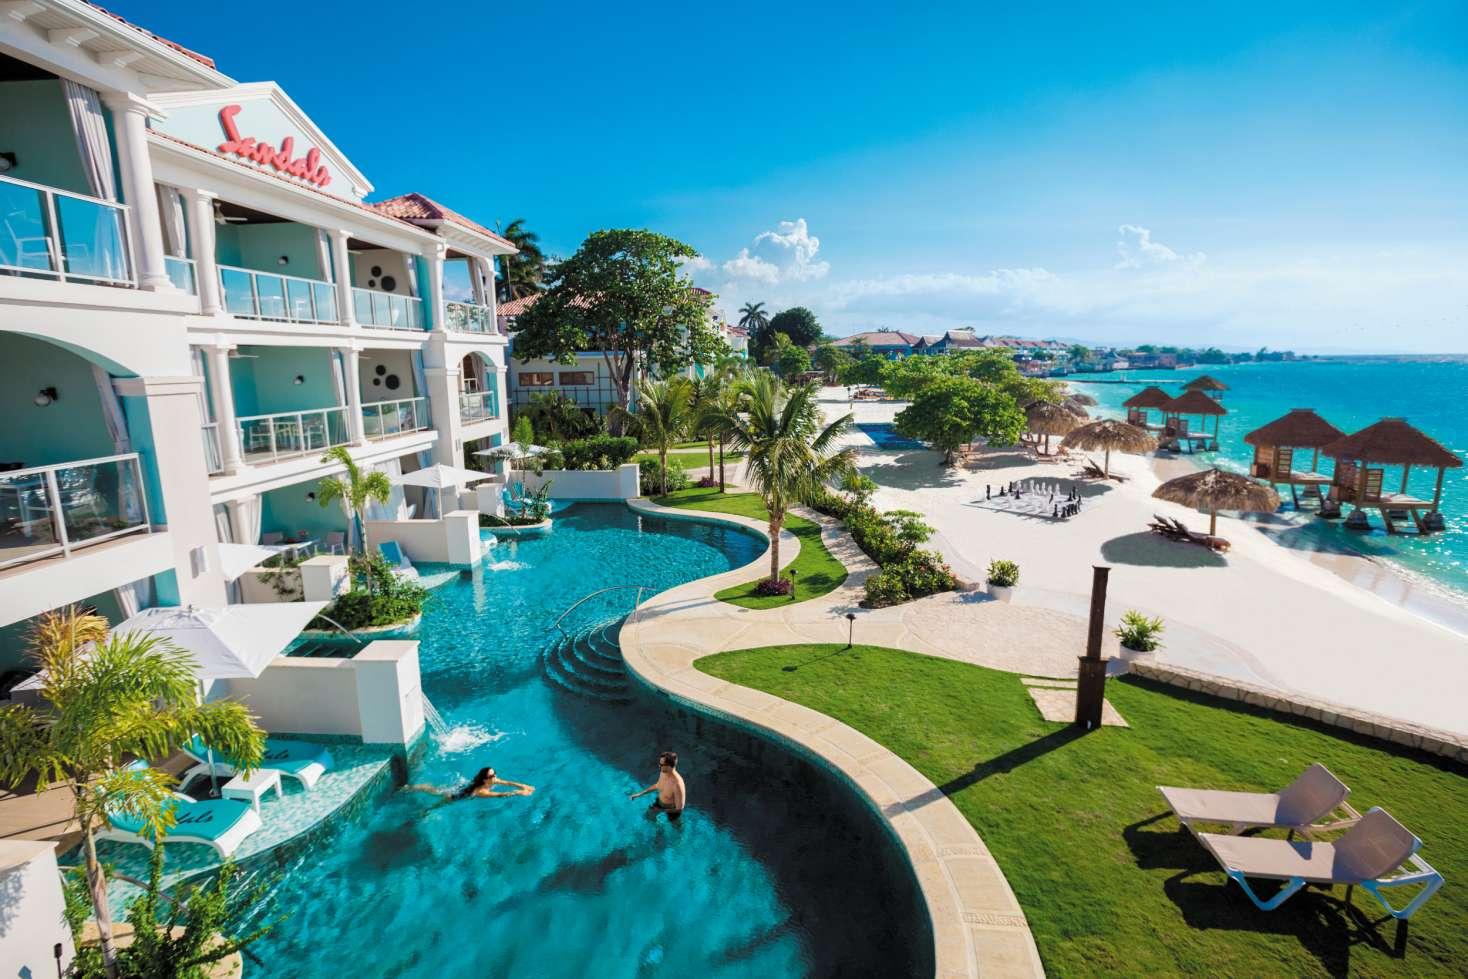 Image of Sandals Montego Bay, Saint James, Jamaica